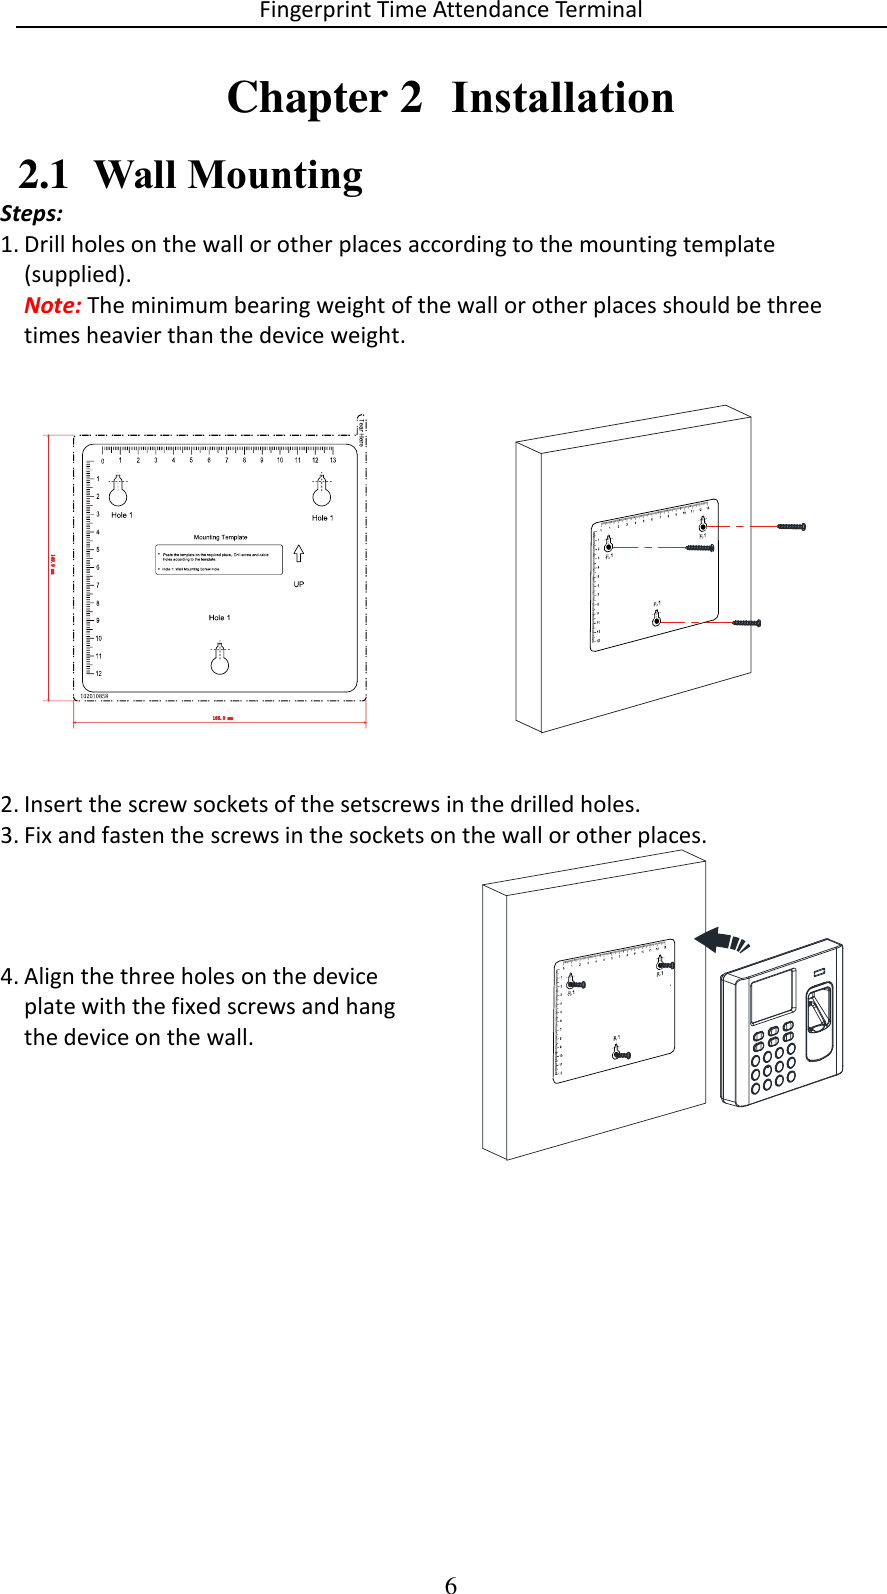 korg nanokontrol 2 manual pdf